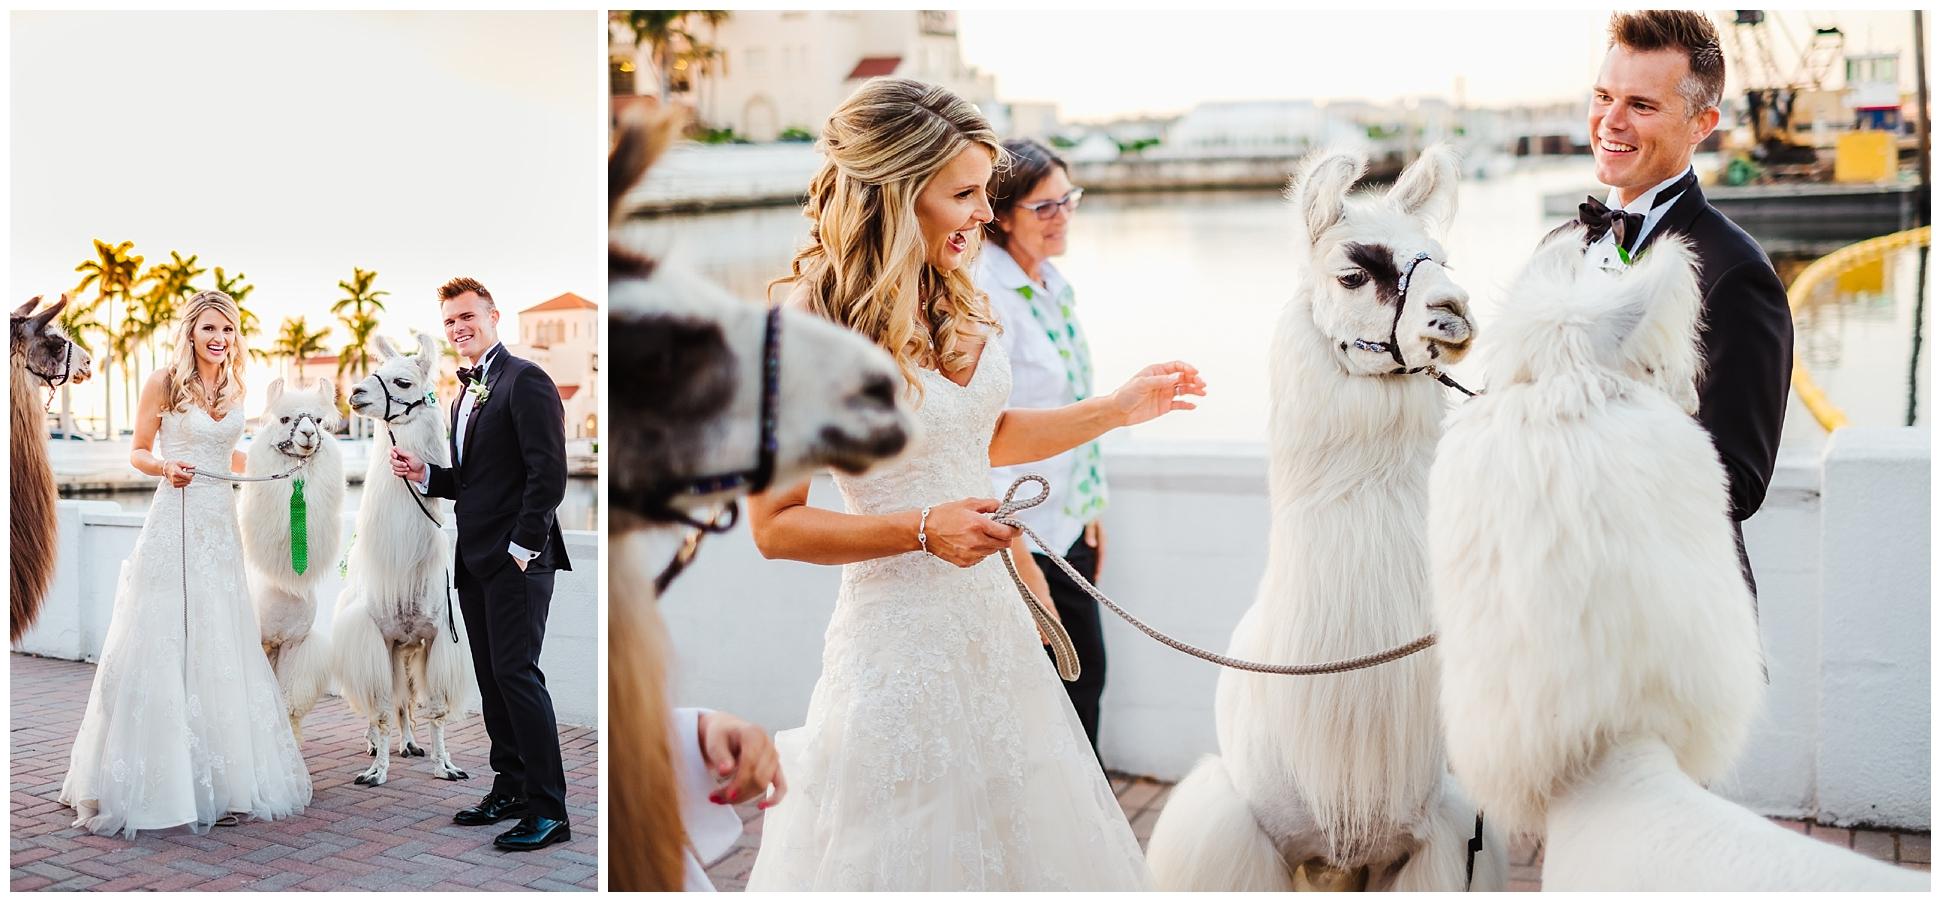 tampa-bradenton-wedding-photographer-south-florida-museum-classic-blush-gold-alpacas-sparklers_0077.jpg